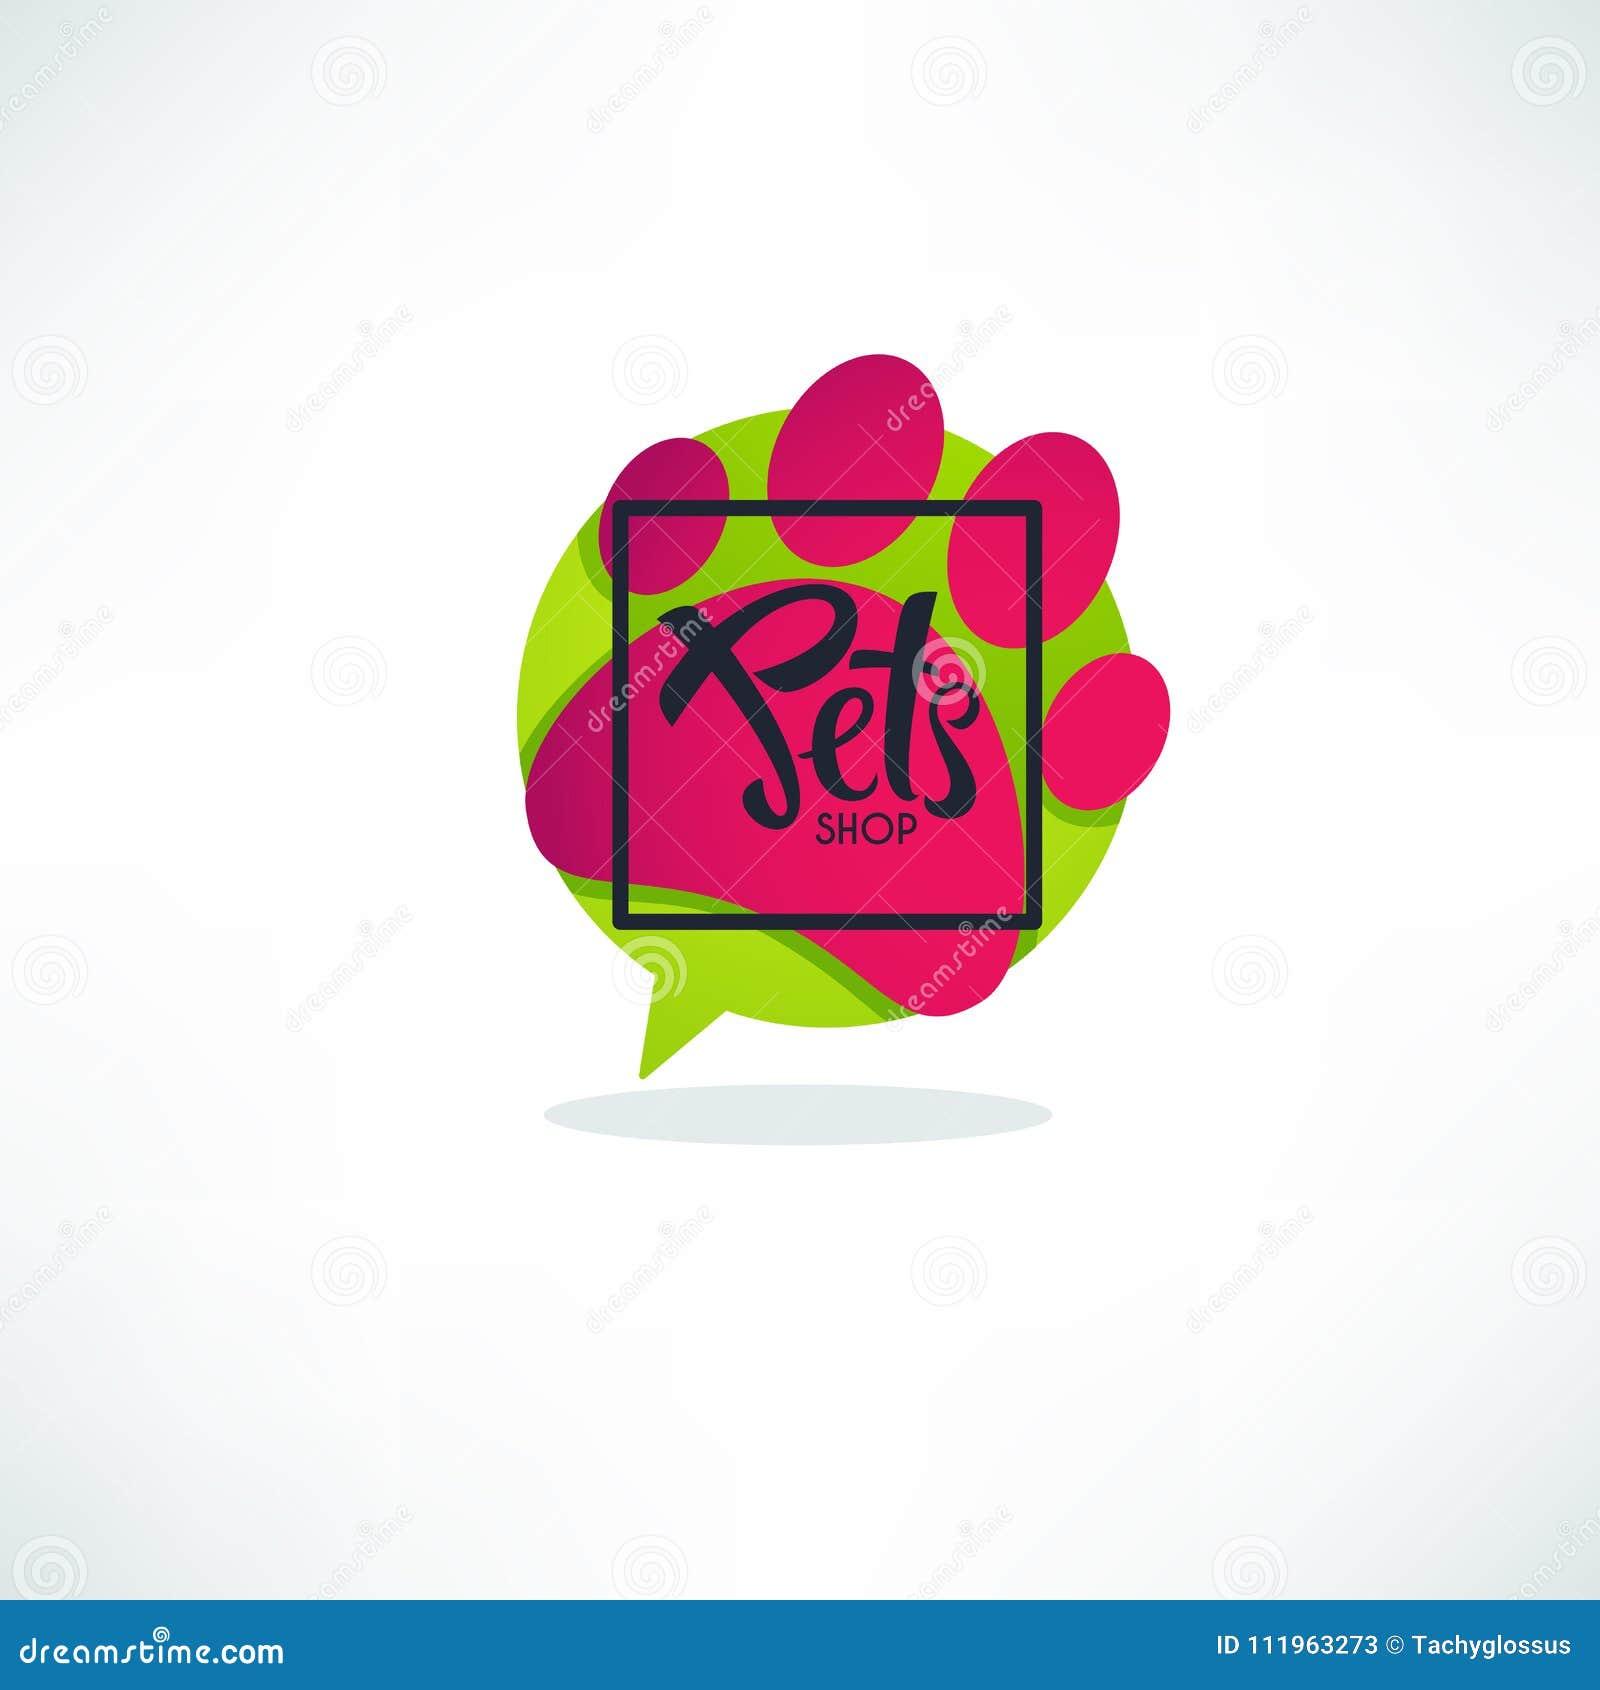 Cat Grooming Pet Shop Logo Template: Pets Shop Logo , Vector Image Of Vibrnt Green Speech Bubble